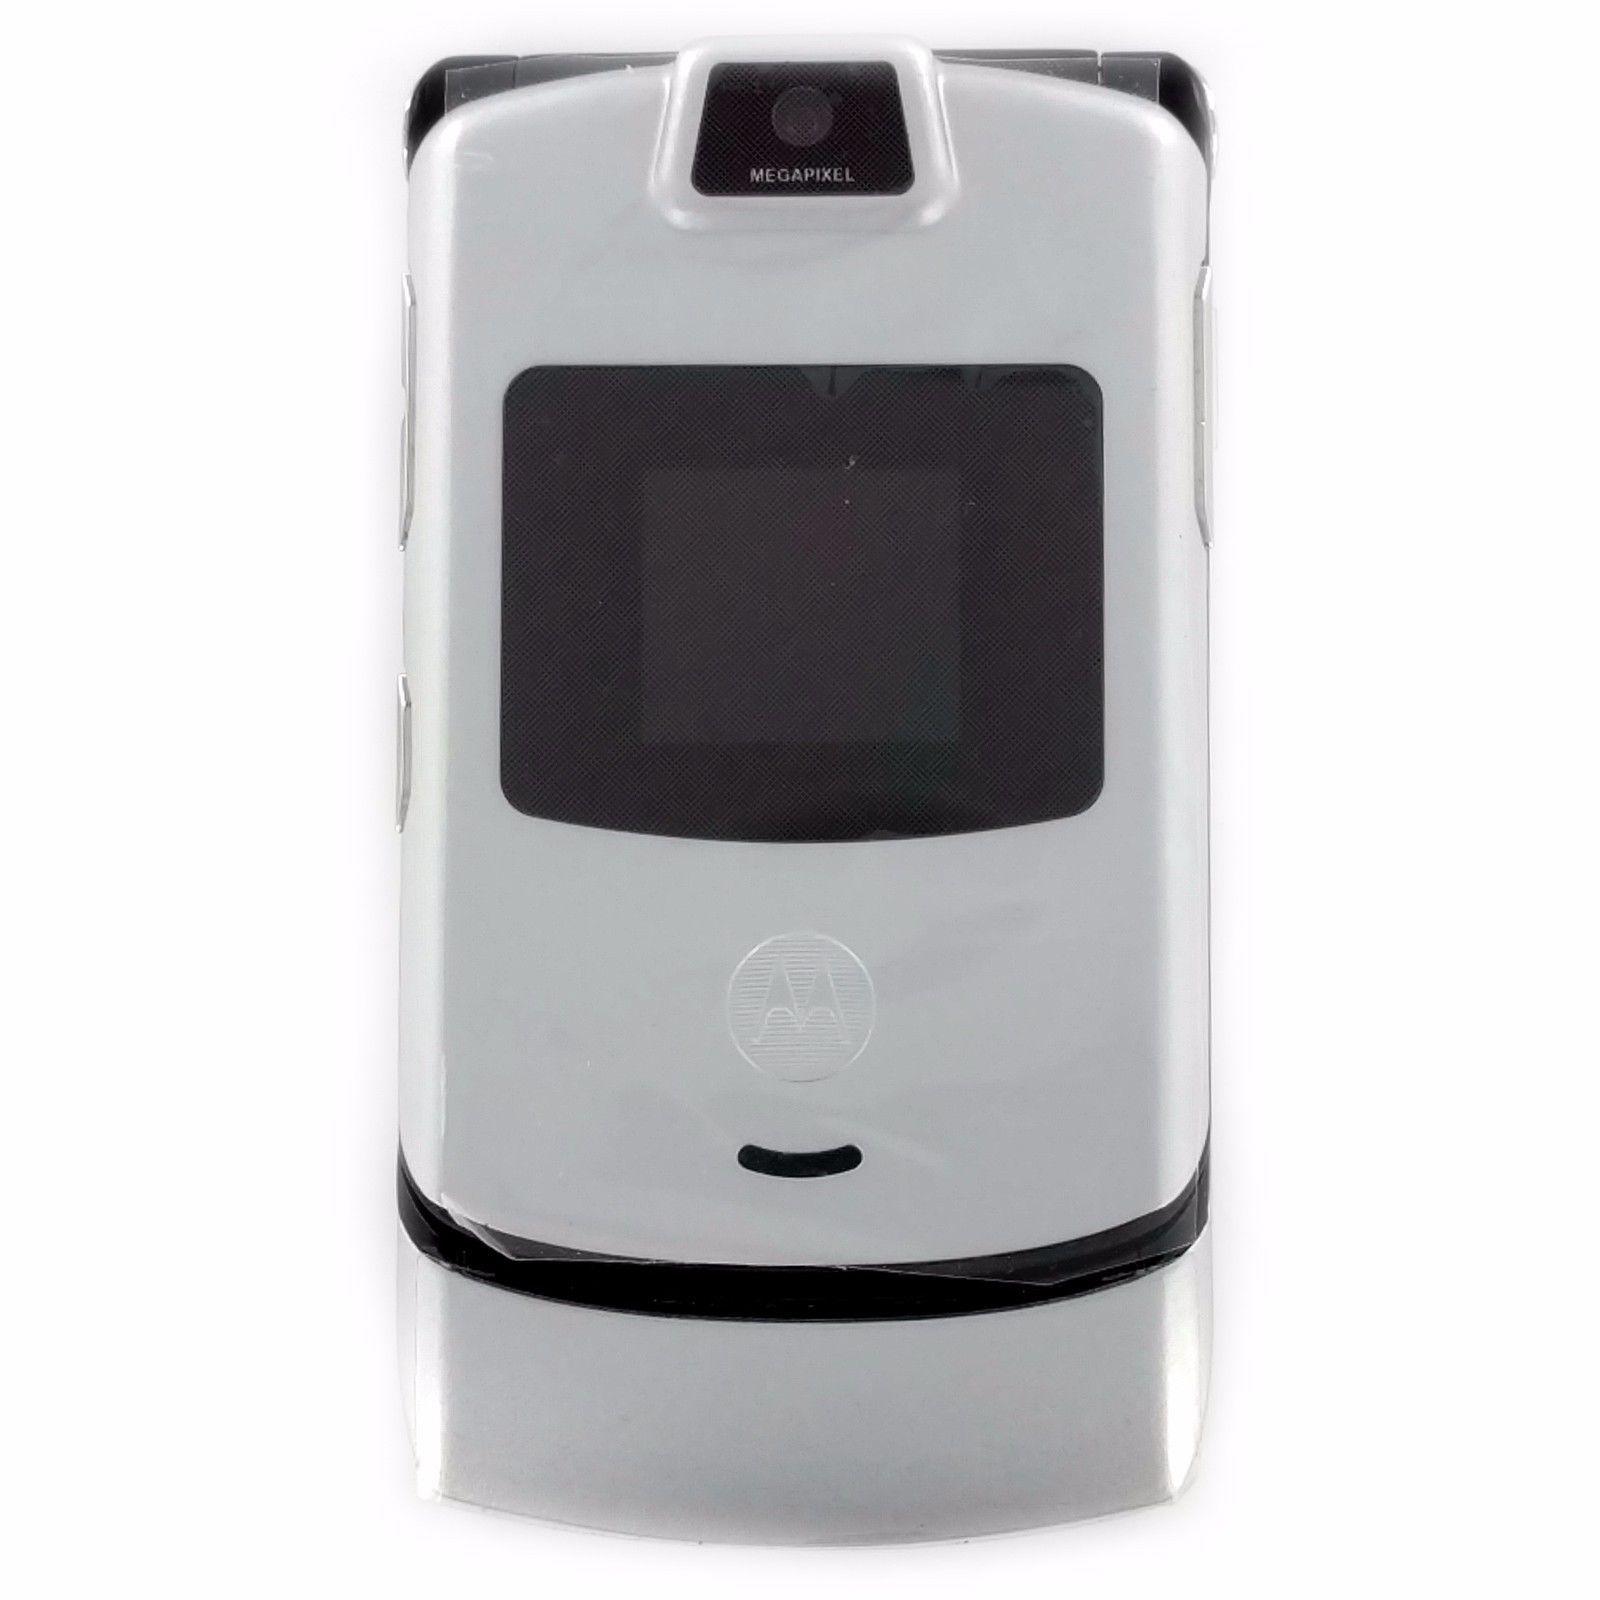 Vibrate Yes Ringer Id Yes Processor Battery 780 Mah Liion Speaker Phone Type Half Duplex Phone Book Capacity 10 Flip Cell Phones Phone New Motorola Razr